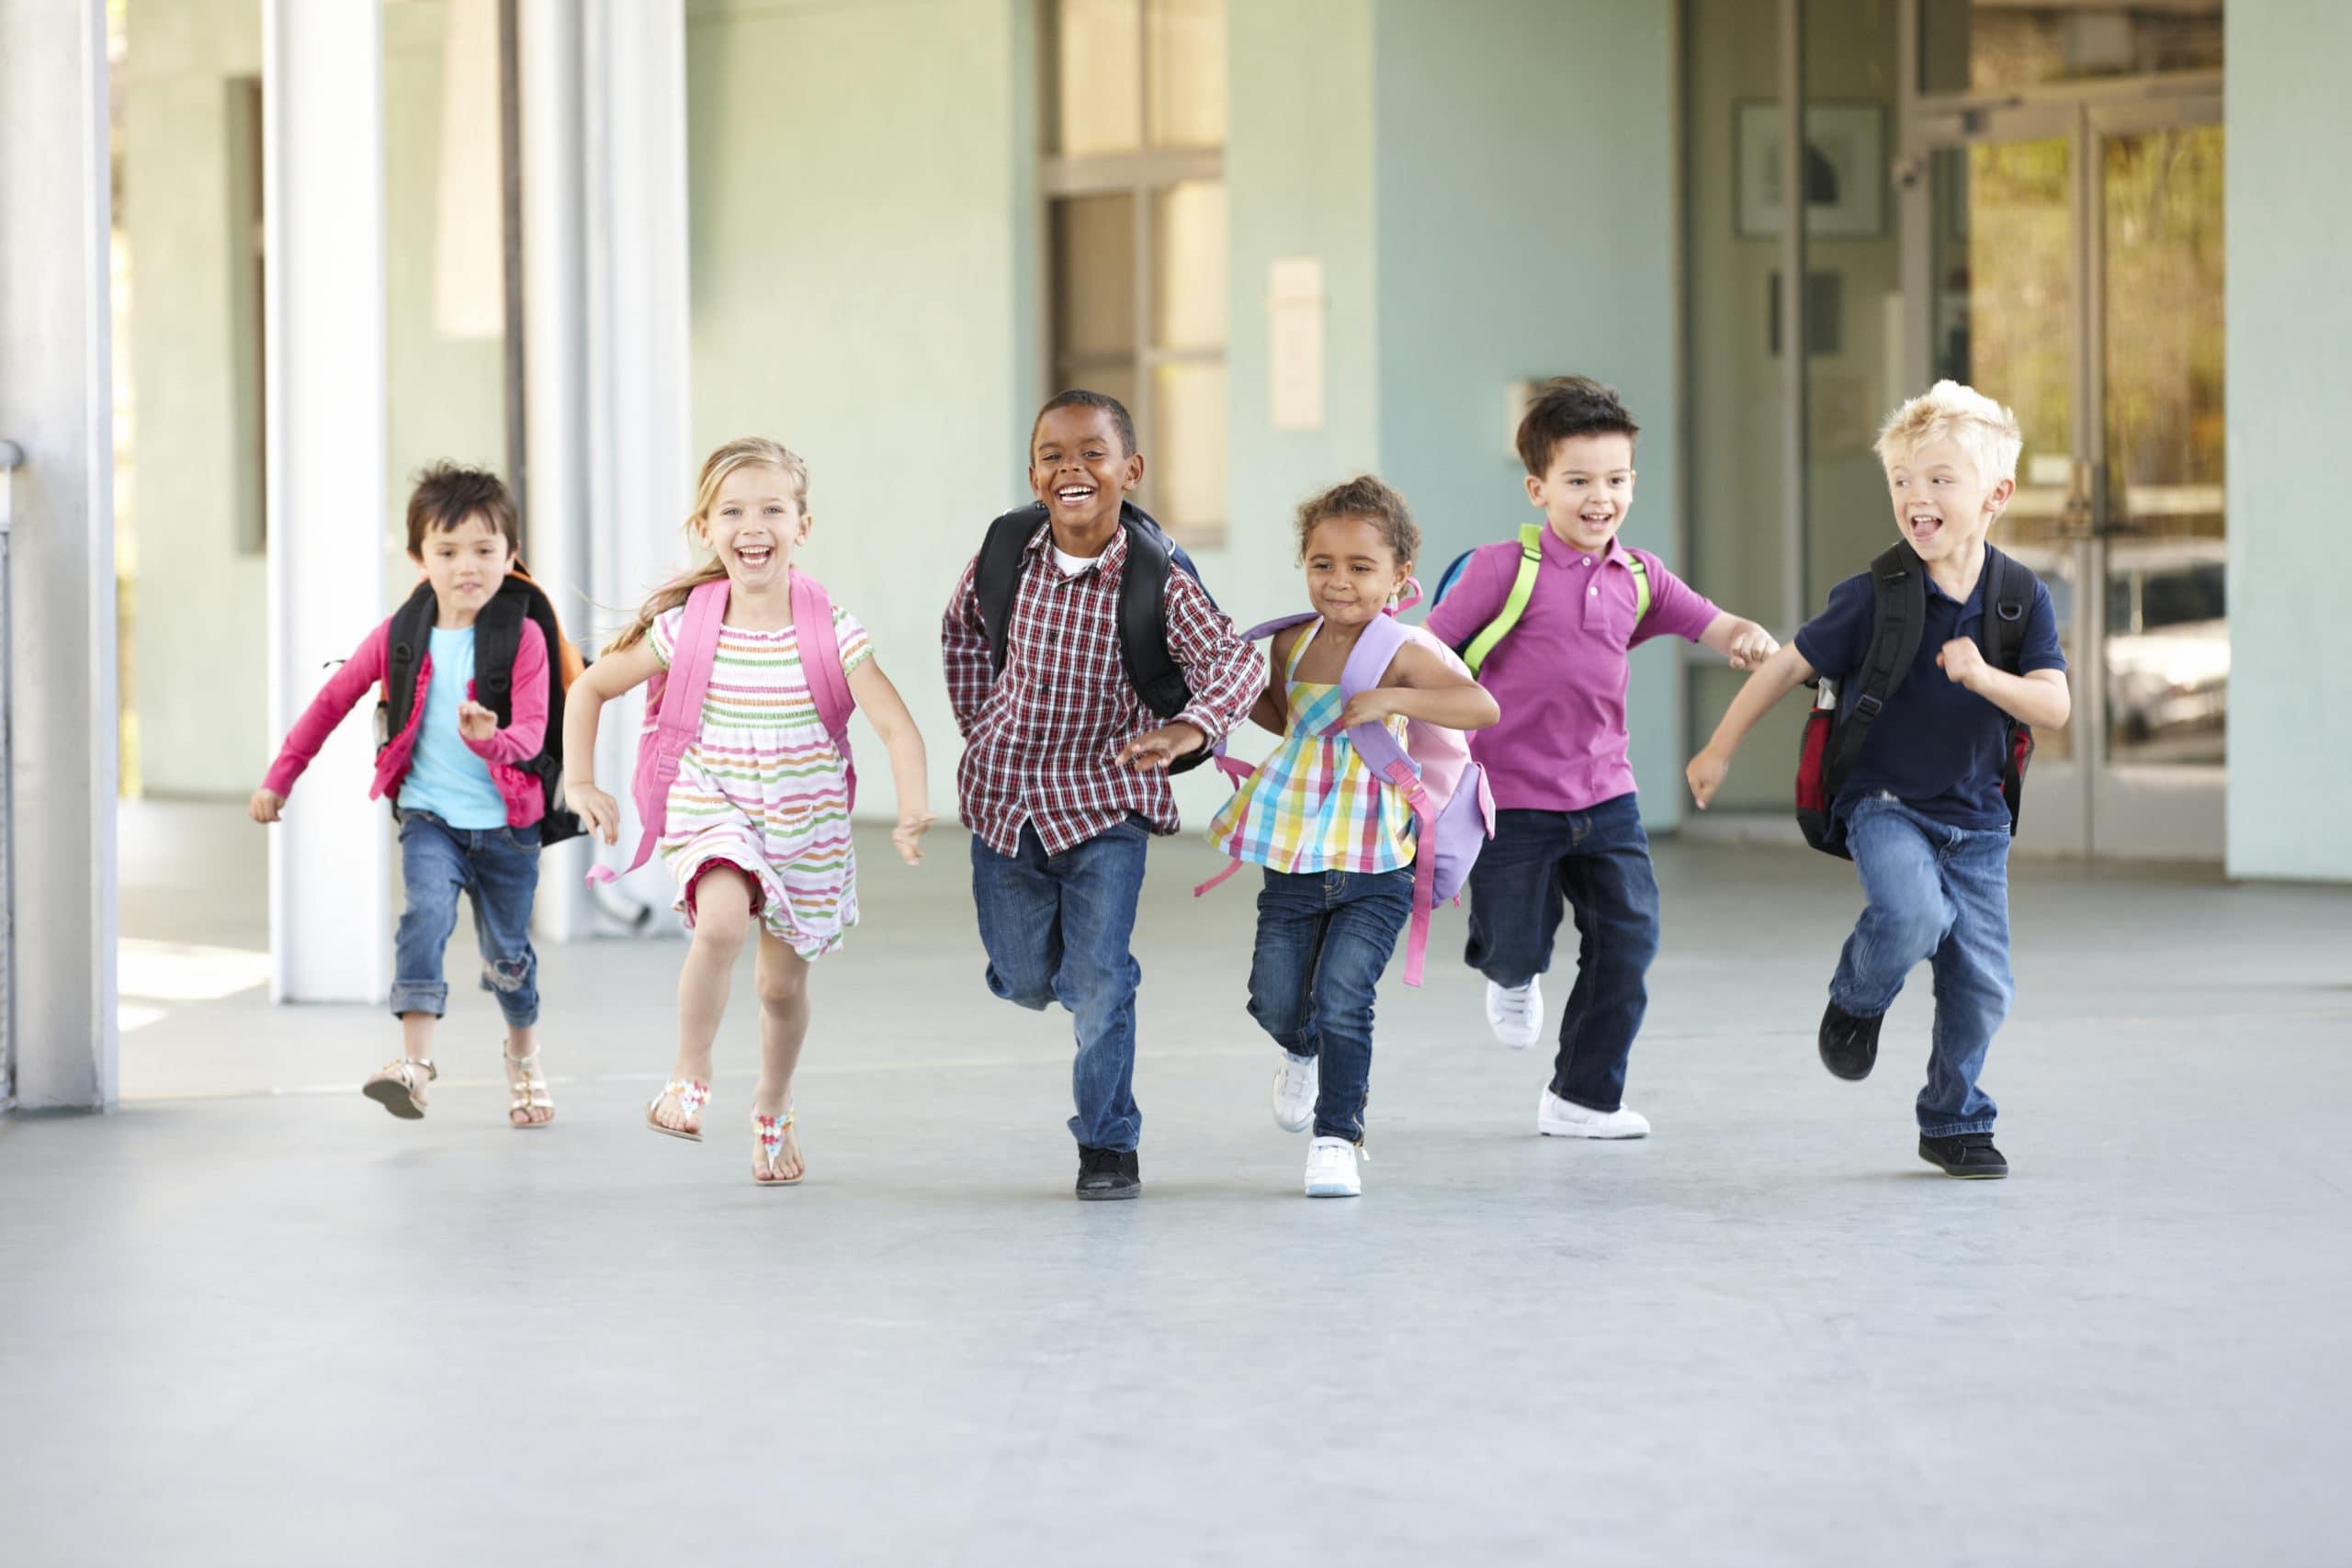 Group Of Elementary Age Schoolchildren Running Outside